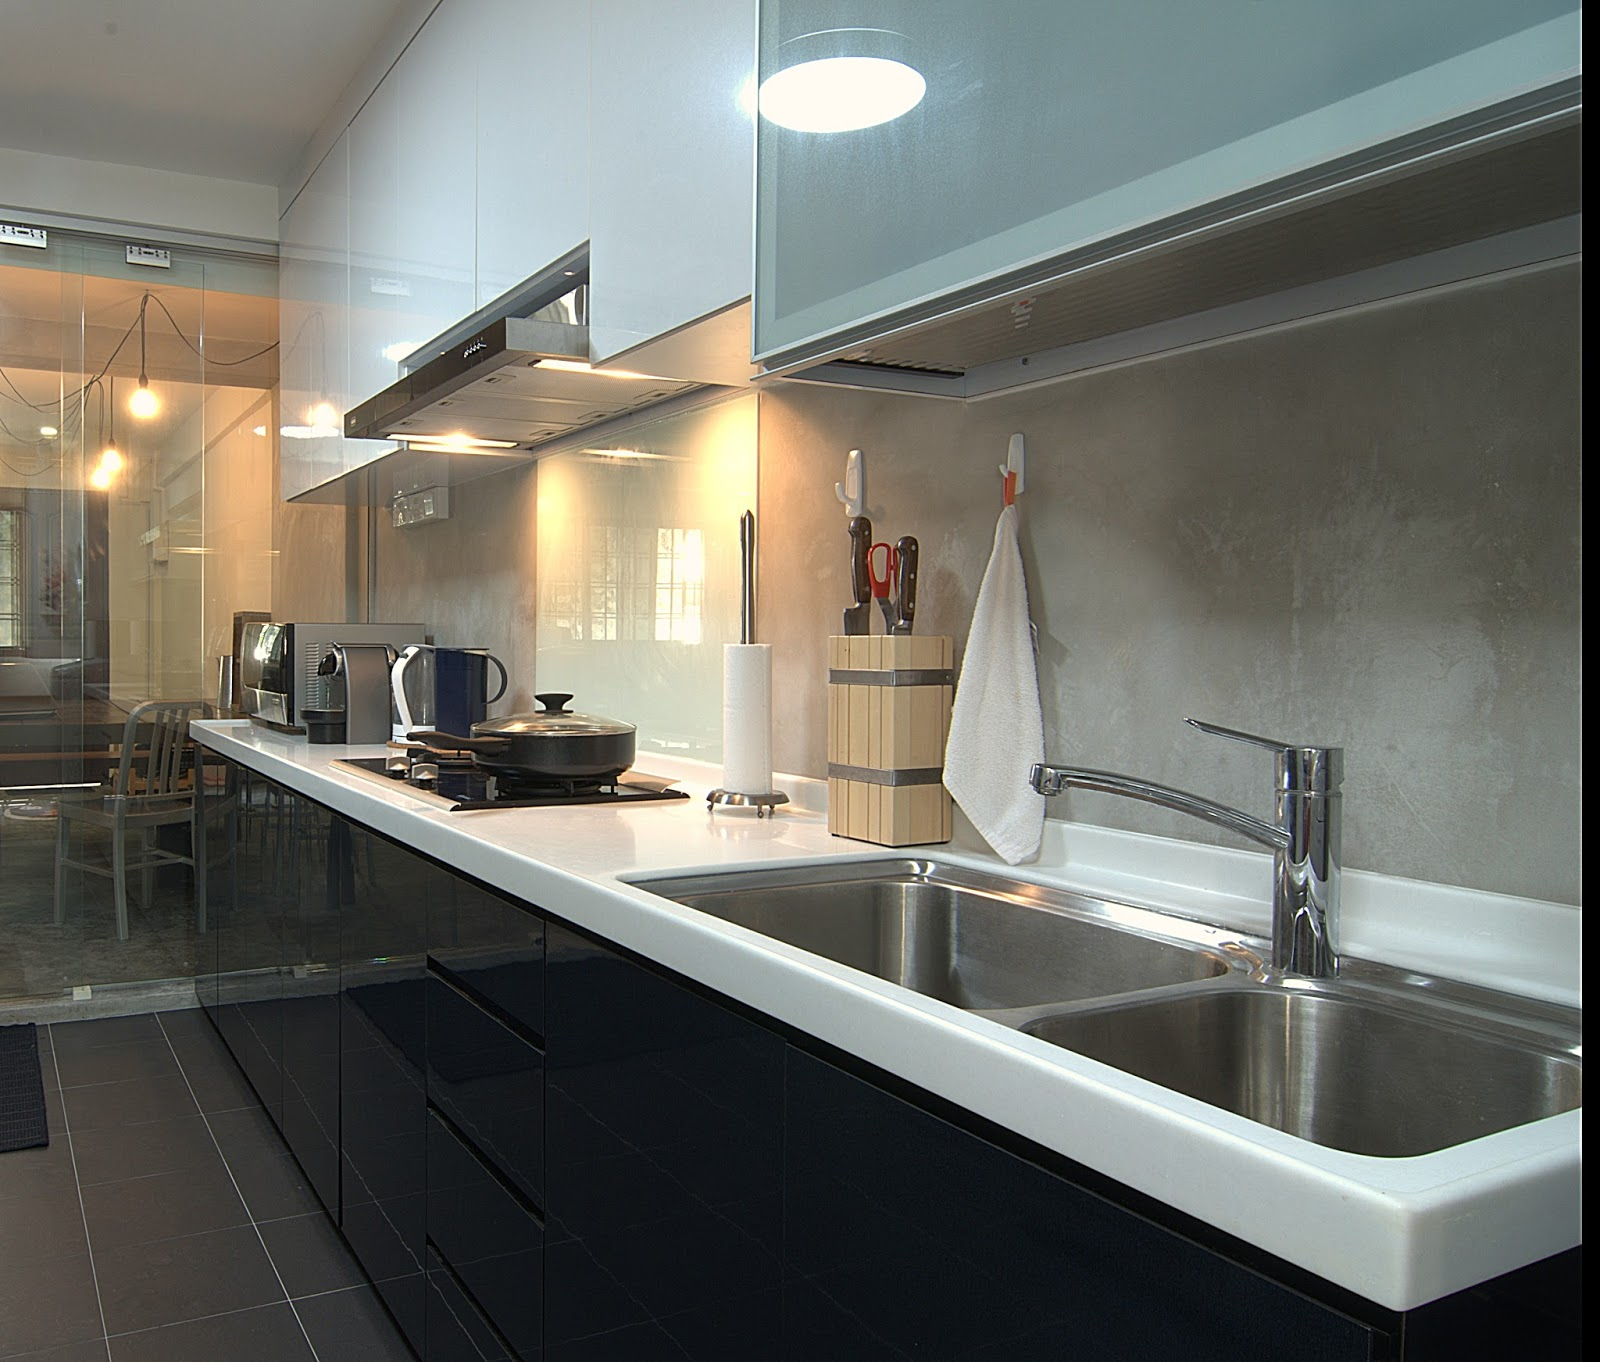 Industrial Kitchen Hdb: Interior Design Guide: HDB 4 Room Interior Design , Raw